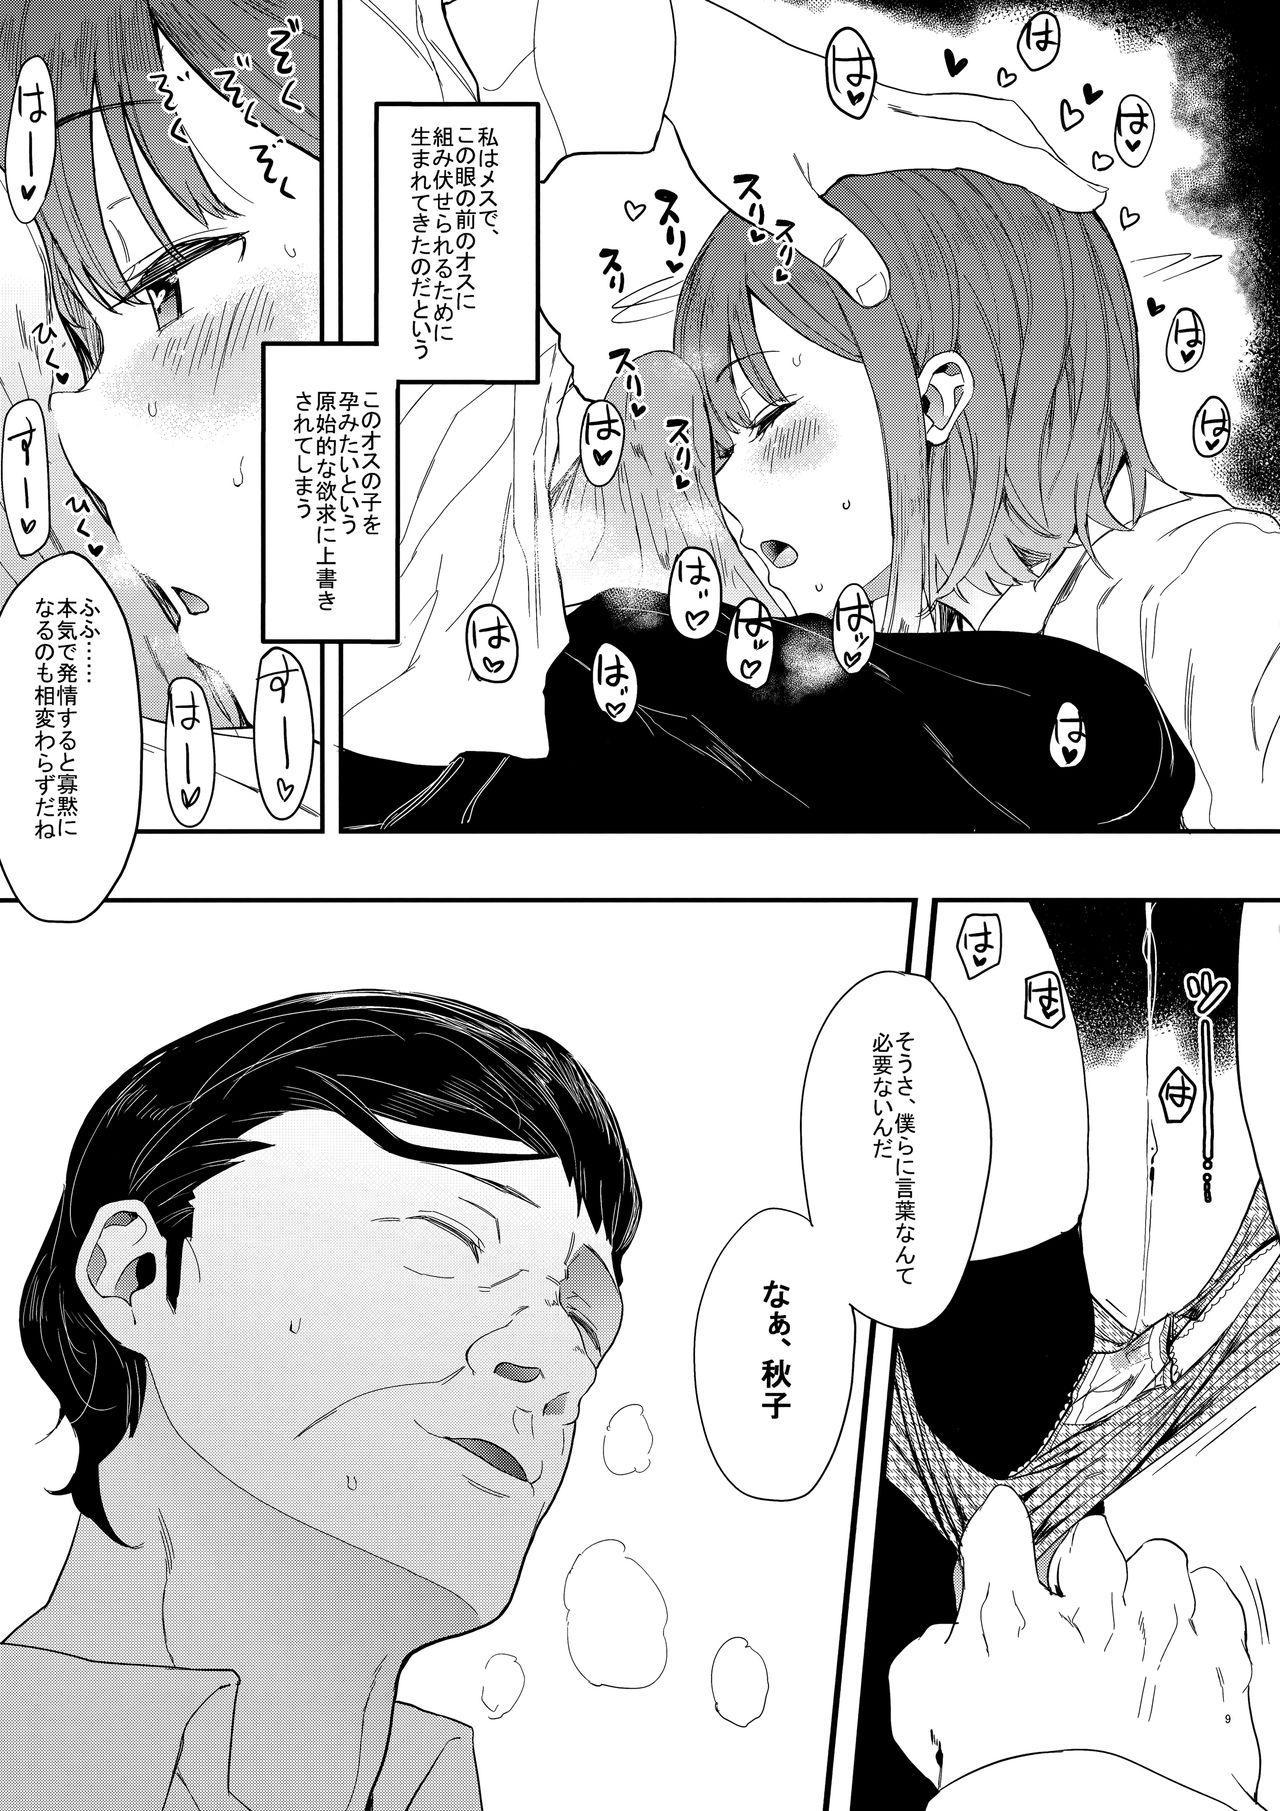 Yuzu-nee 9